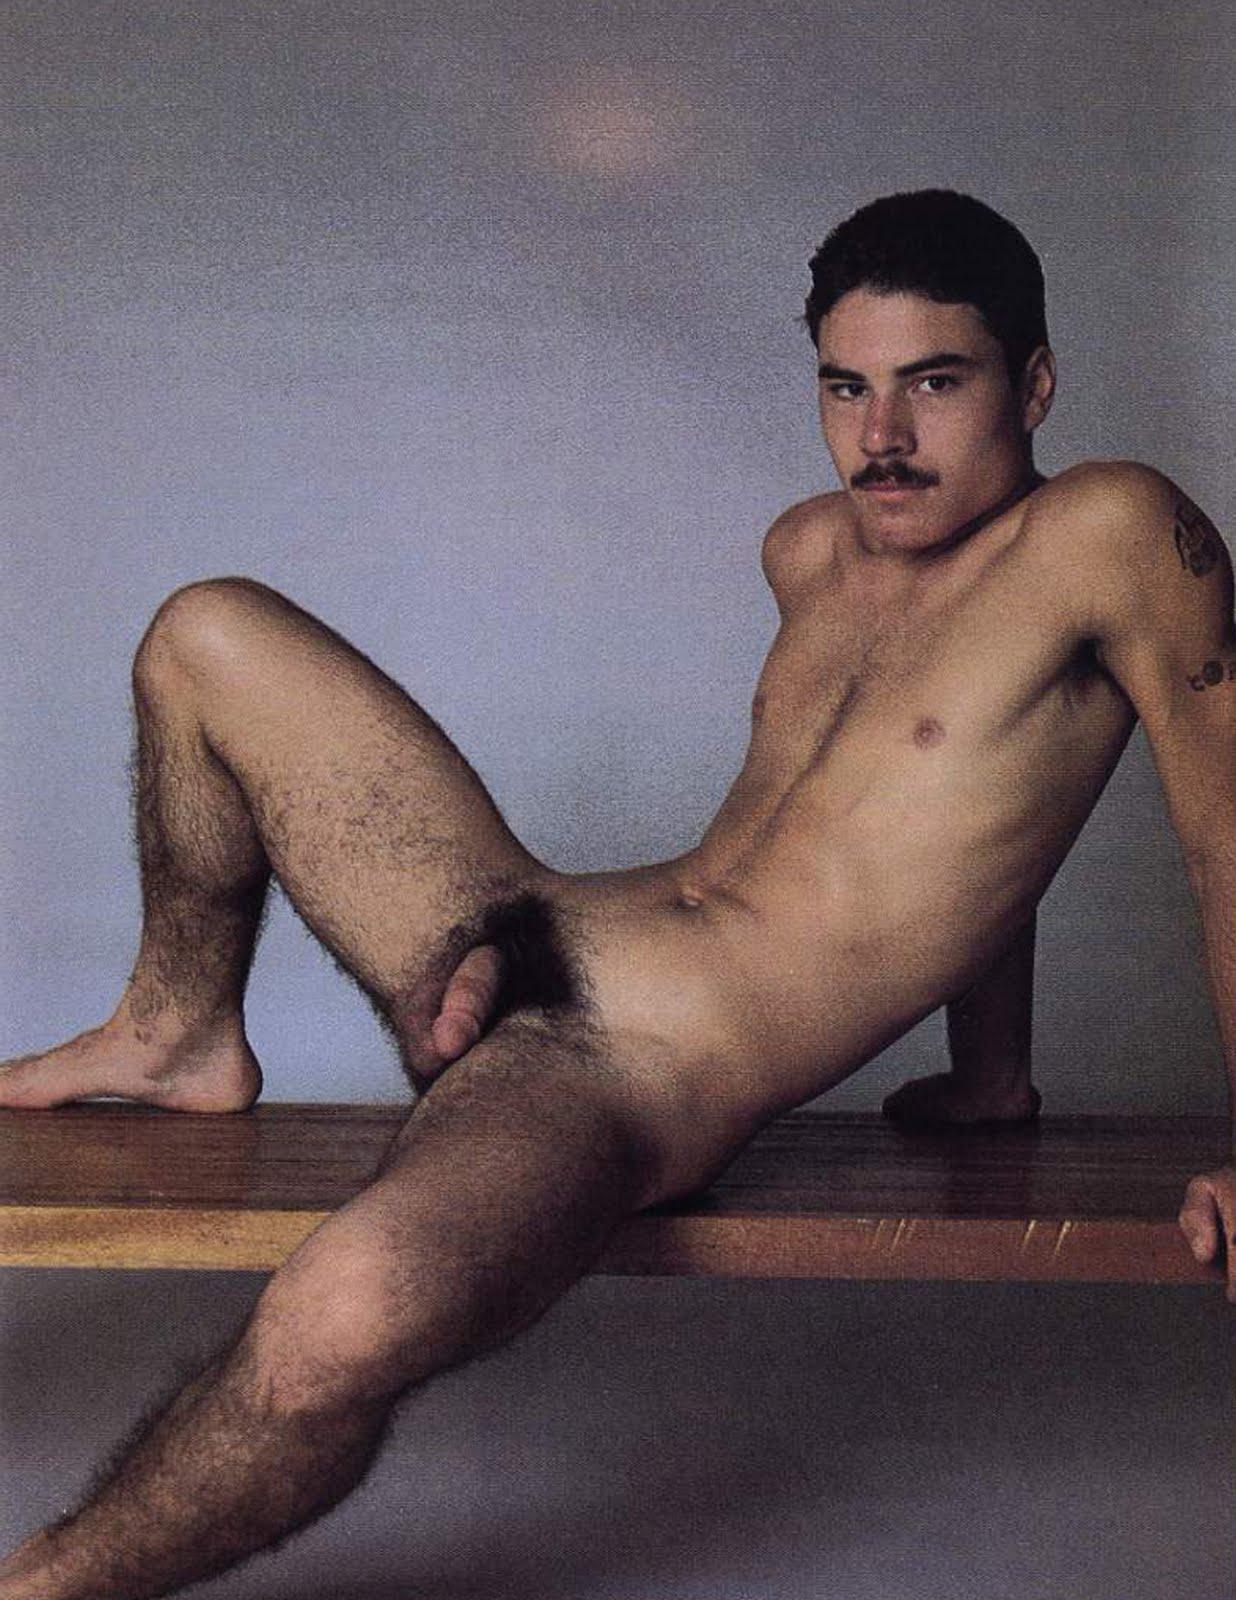 asian lesbin gay porn